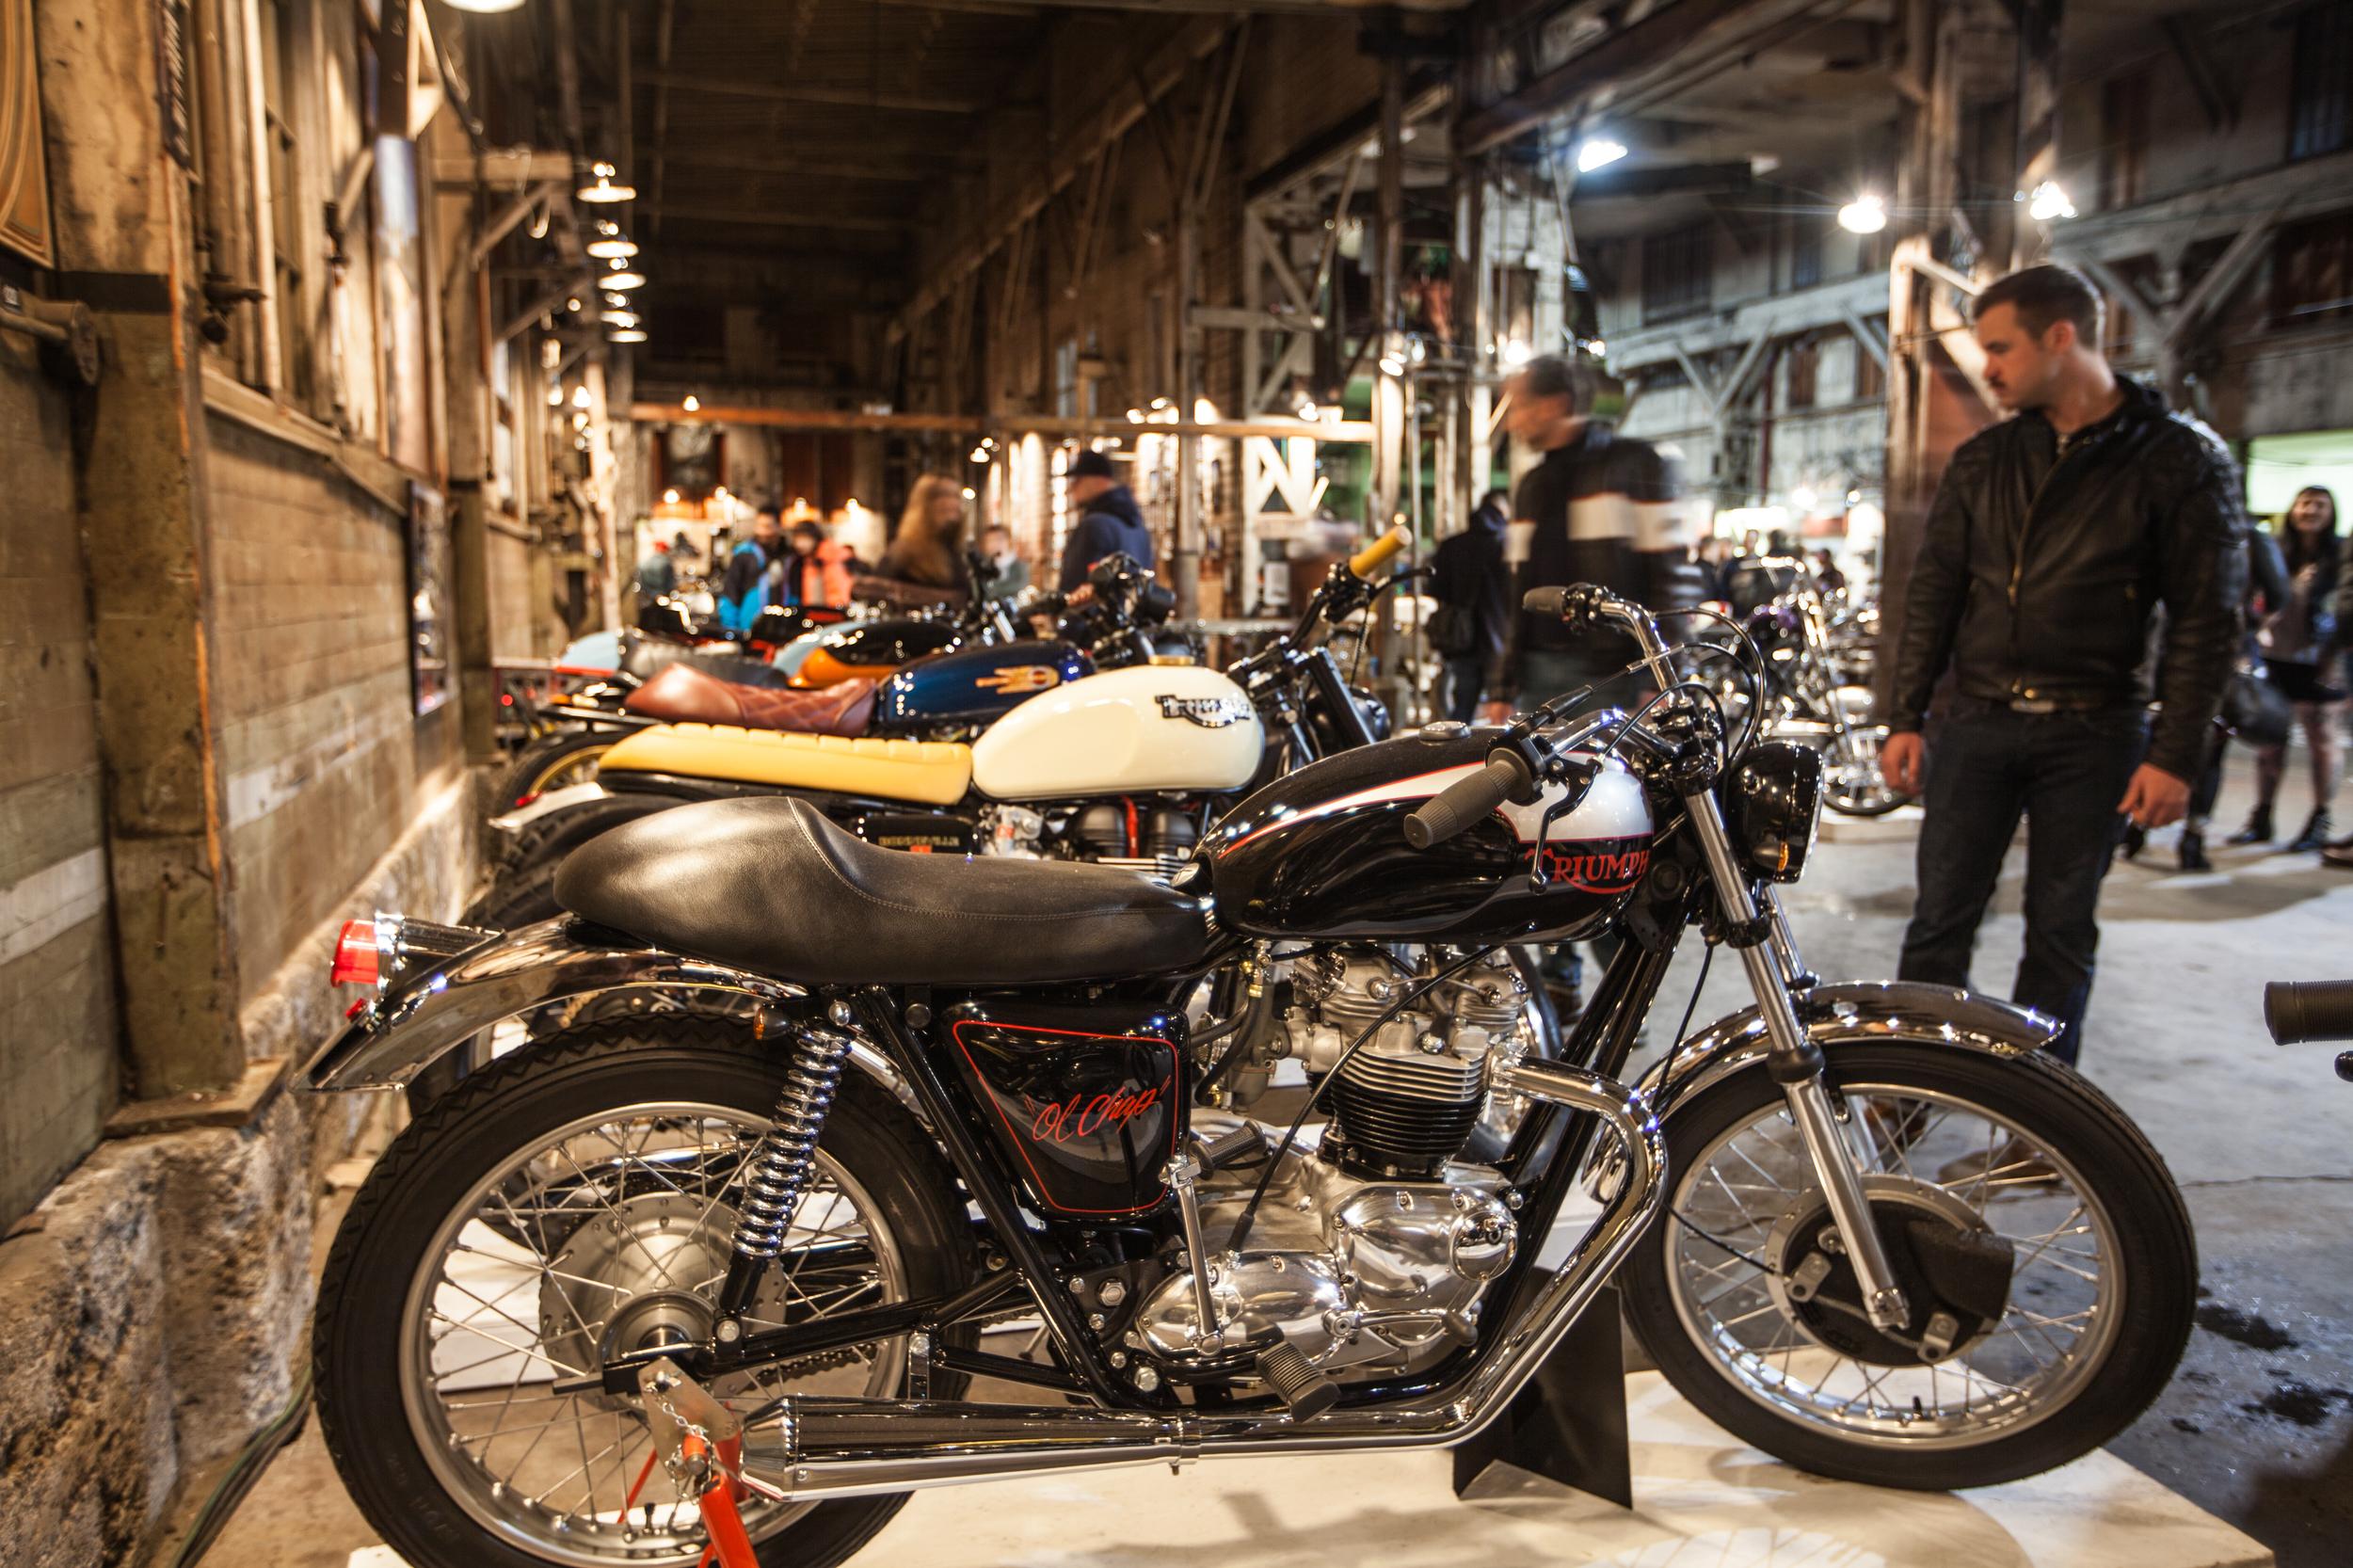 02-14-15 The 1 Moto Show - 2_-18-20.jpg